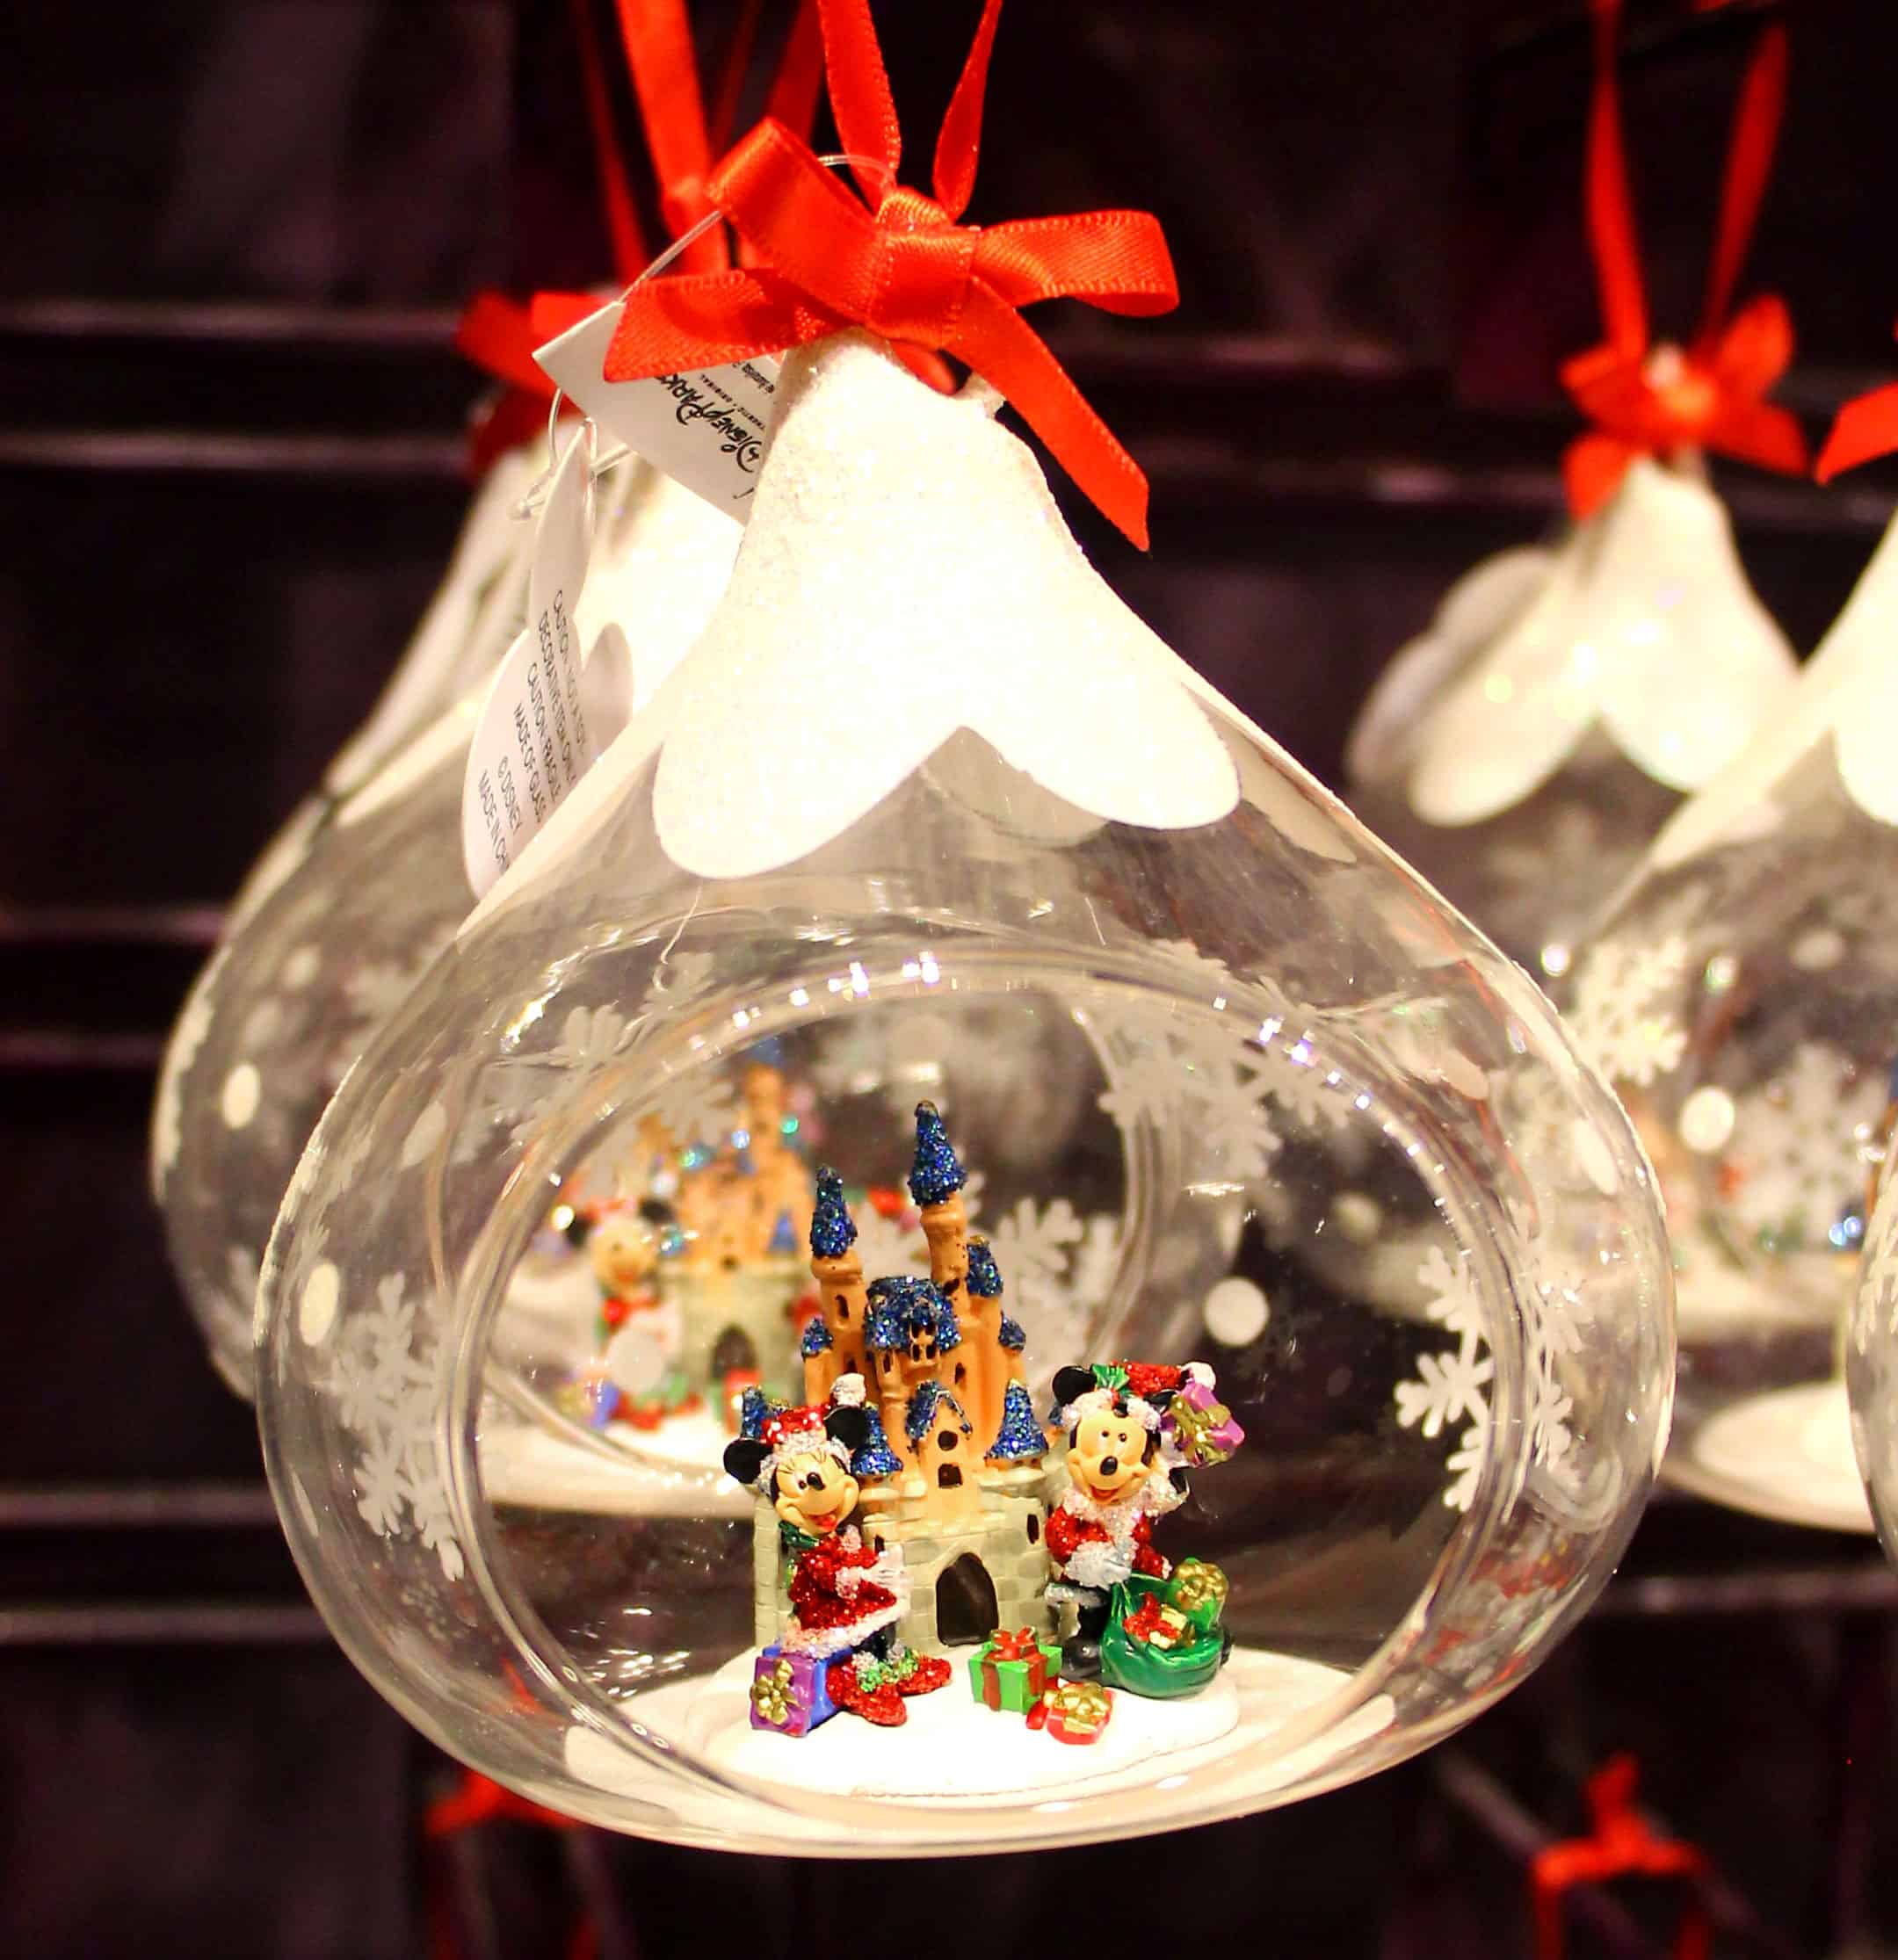 Christbaumkugeln Besondere.Weihnachtskugeln Comic Baumkugeln Mit Beliebten Comicfiguren